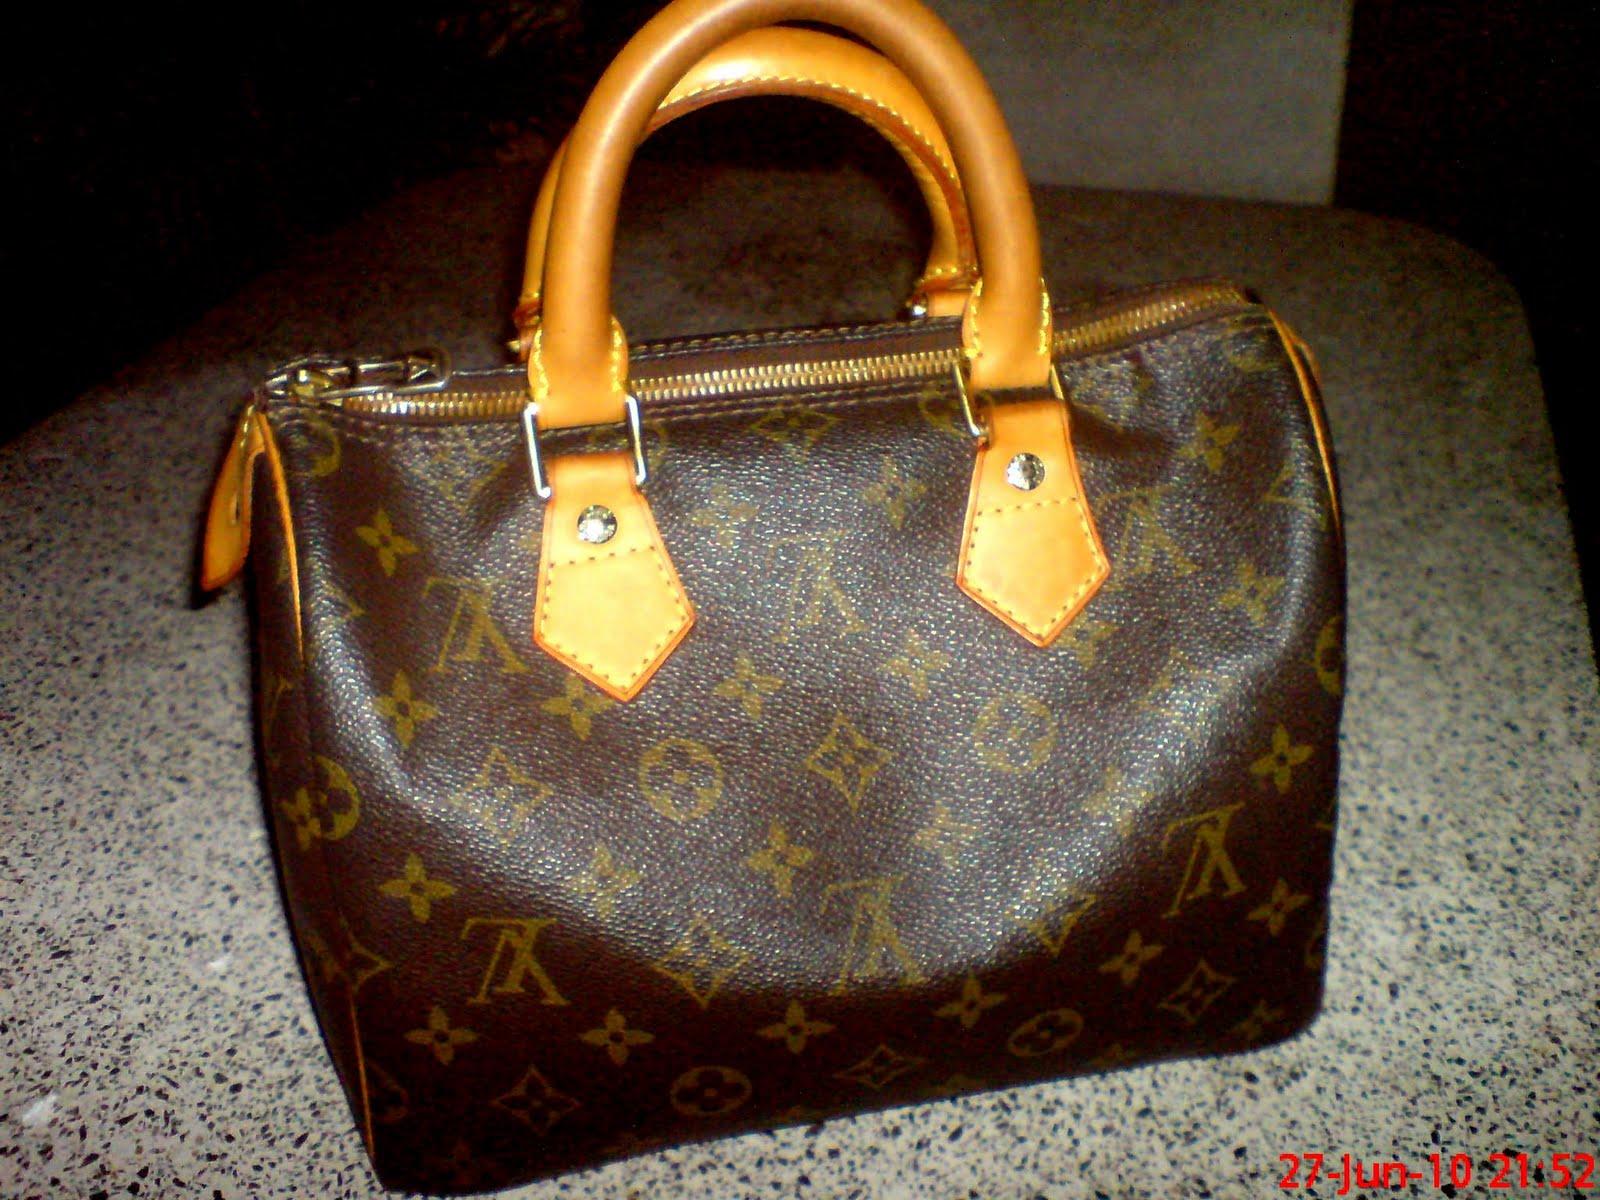 Lv Monogram Handbag Sold Out